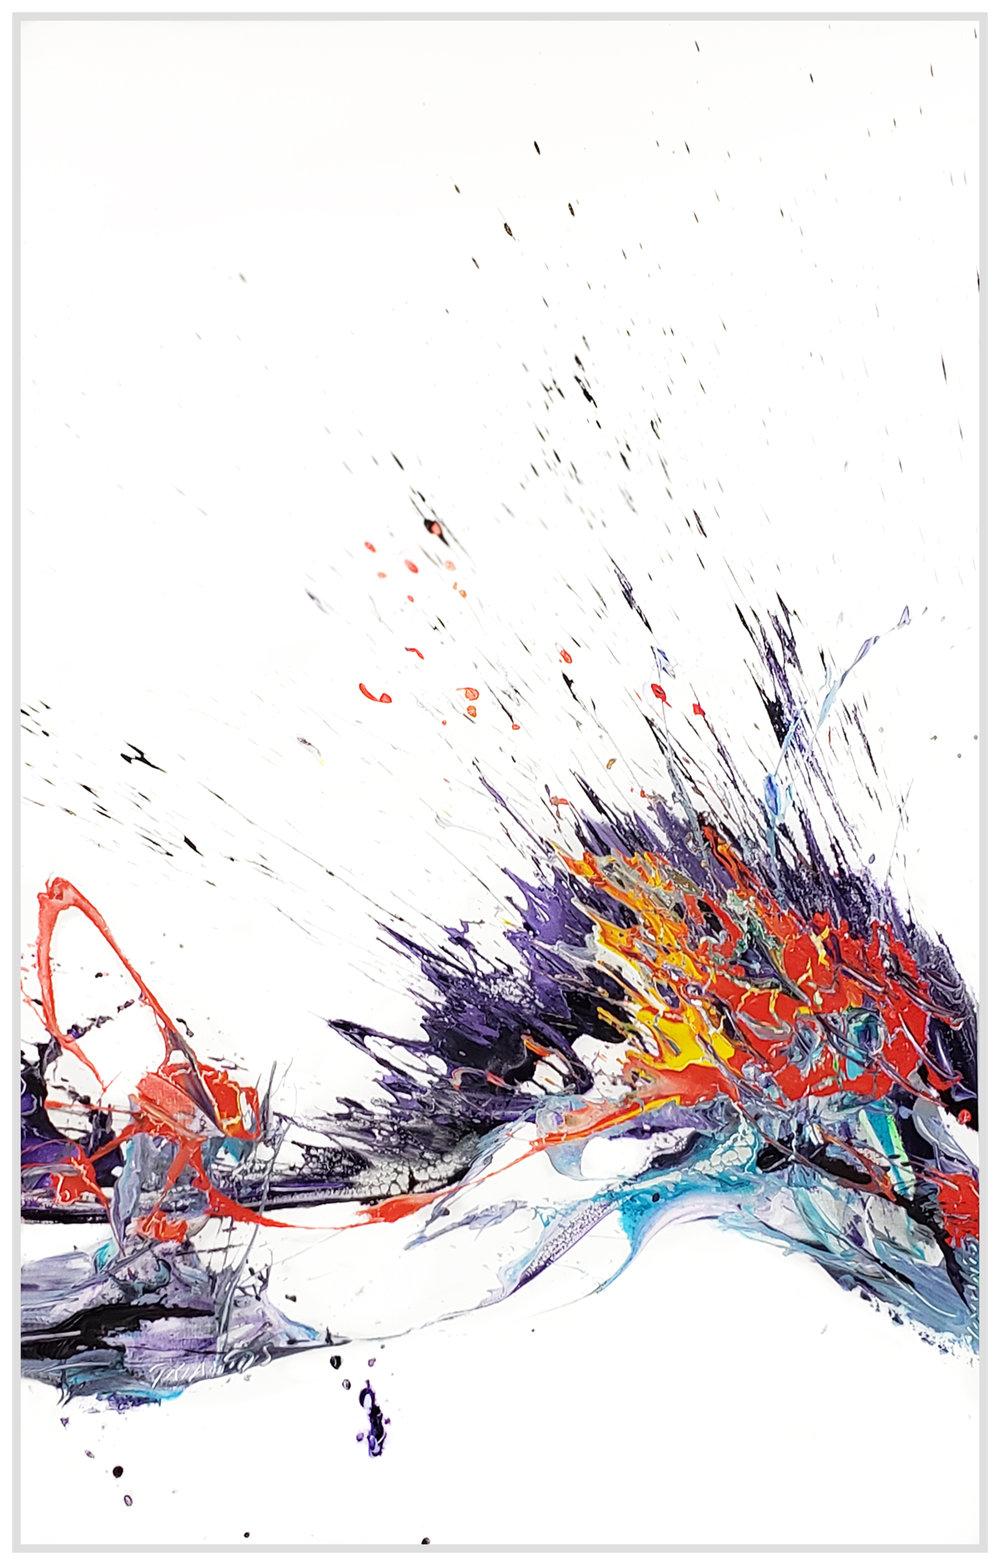 "Splash of Colour #148, 2019, acrylic on canvas, 60"" x 96"" (152.4 x 244cm)"